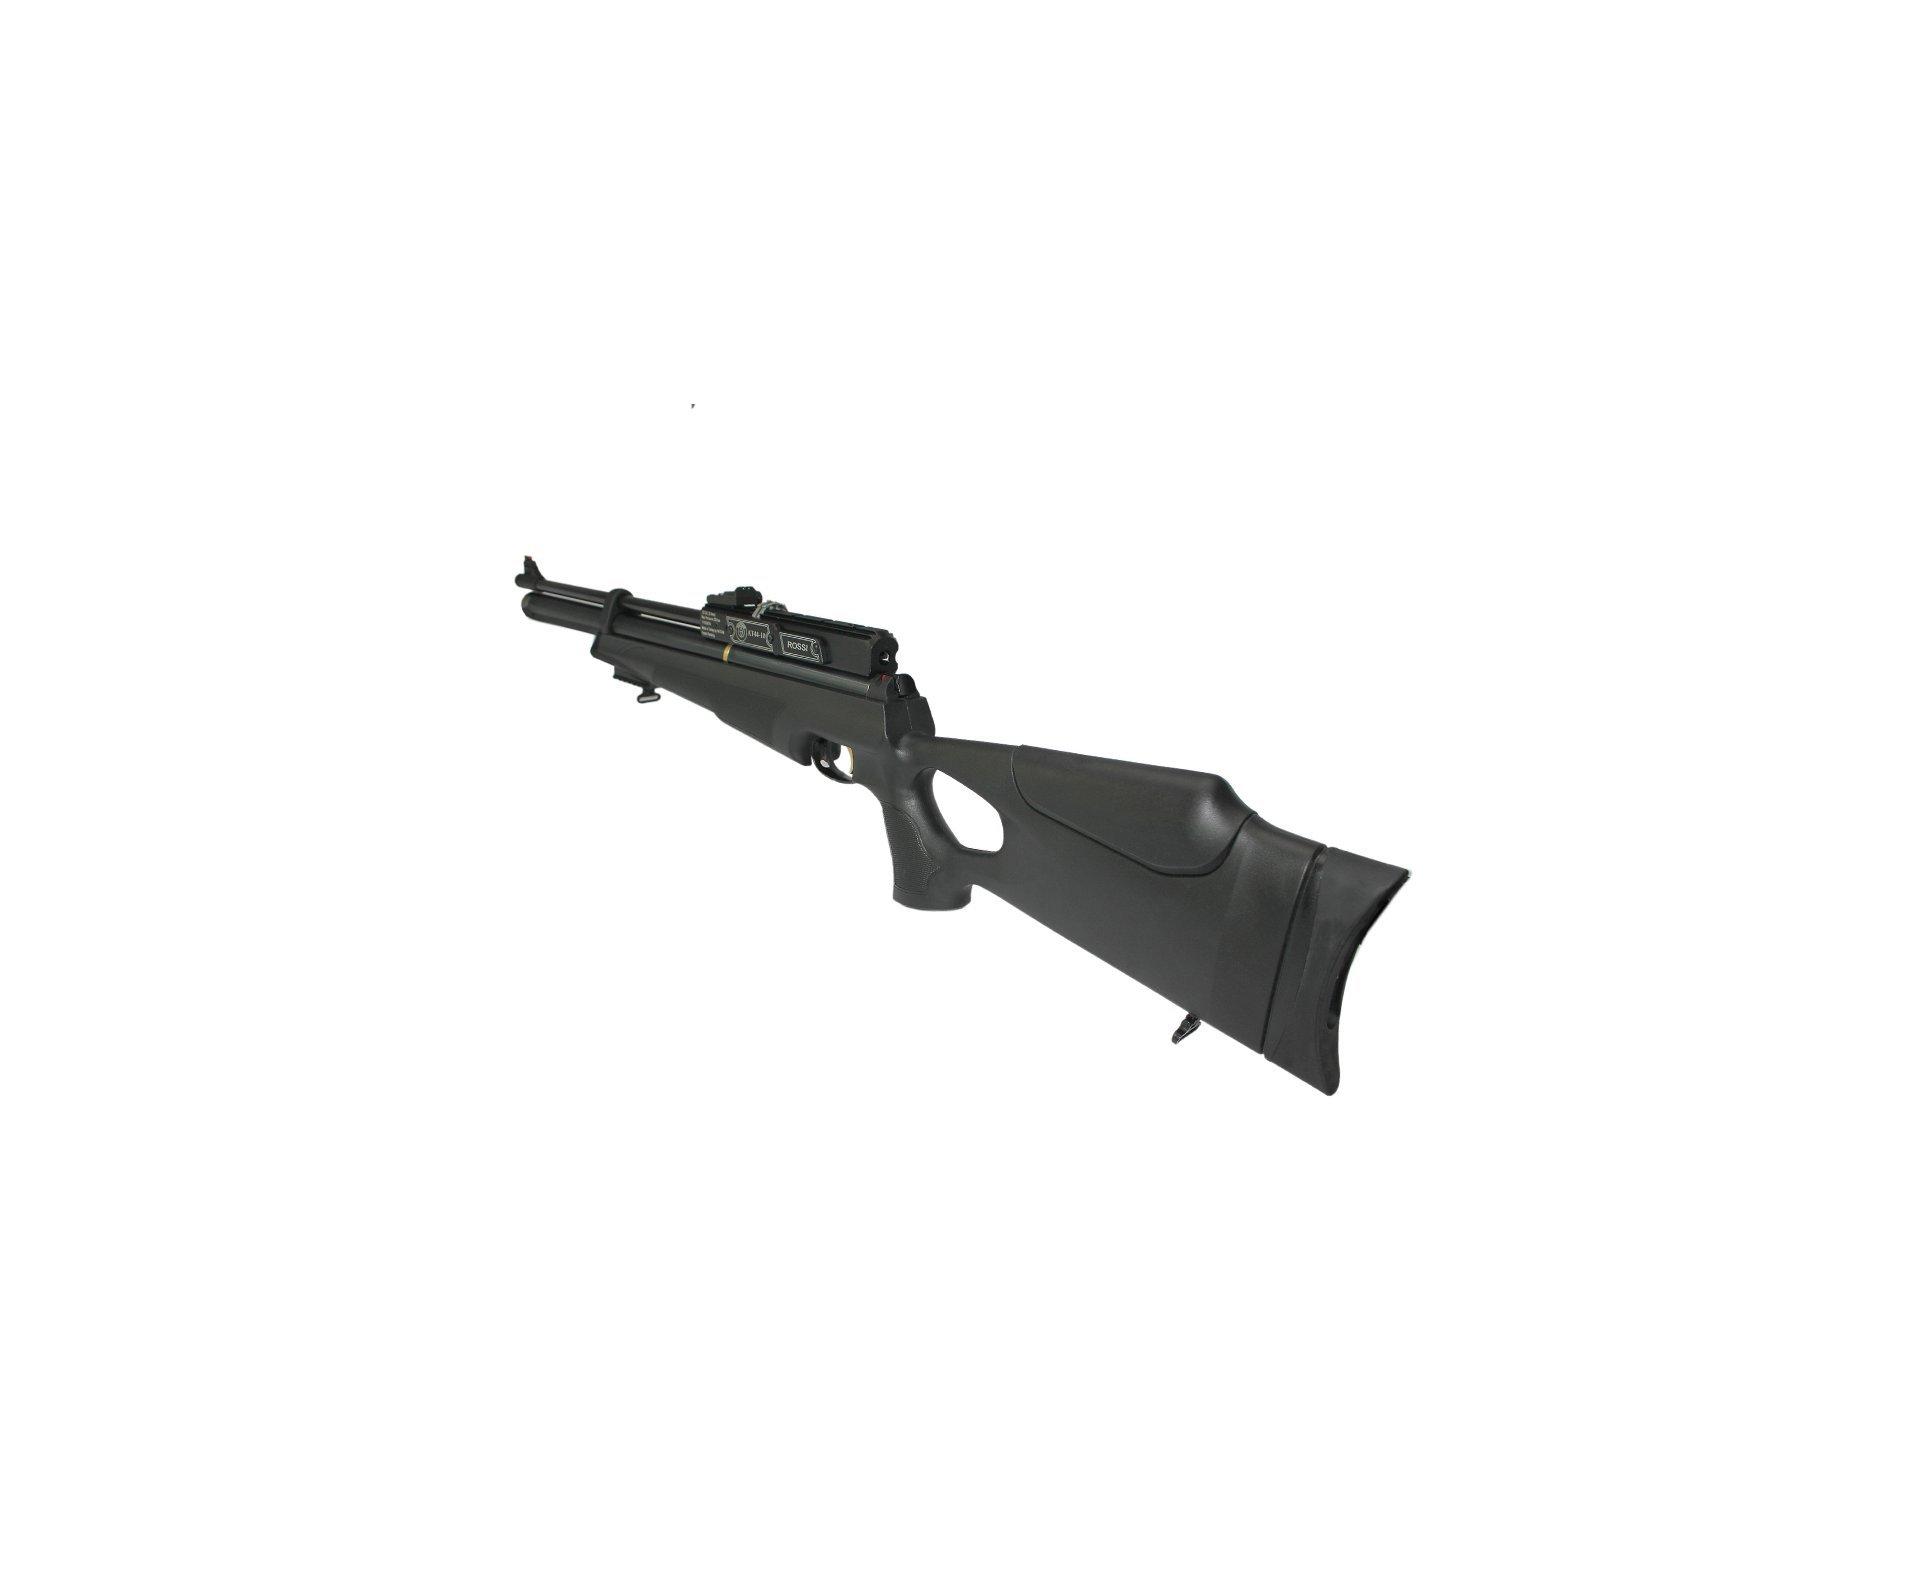 "Carabina De Pressão Hatsan Pcp At44-10 - Calibre 5,5 Mm + Capa 46"""